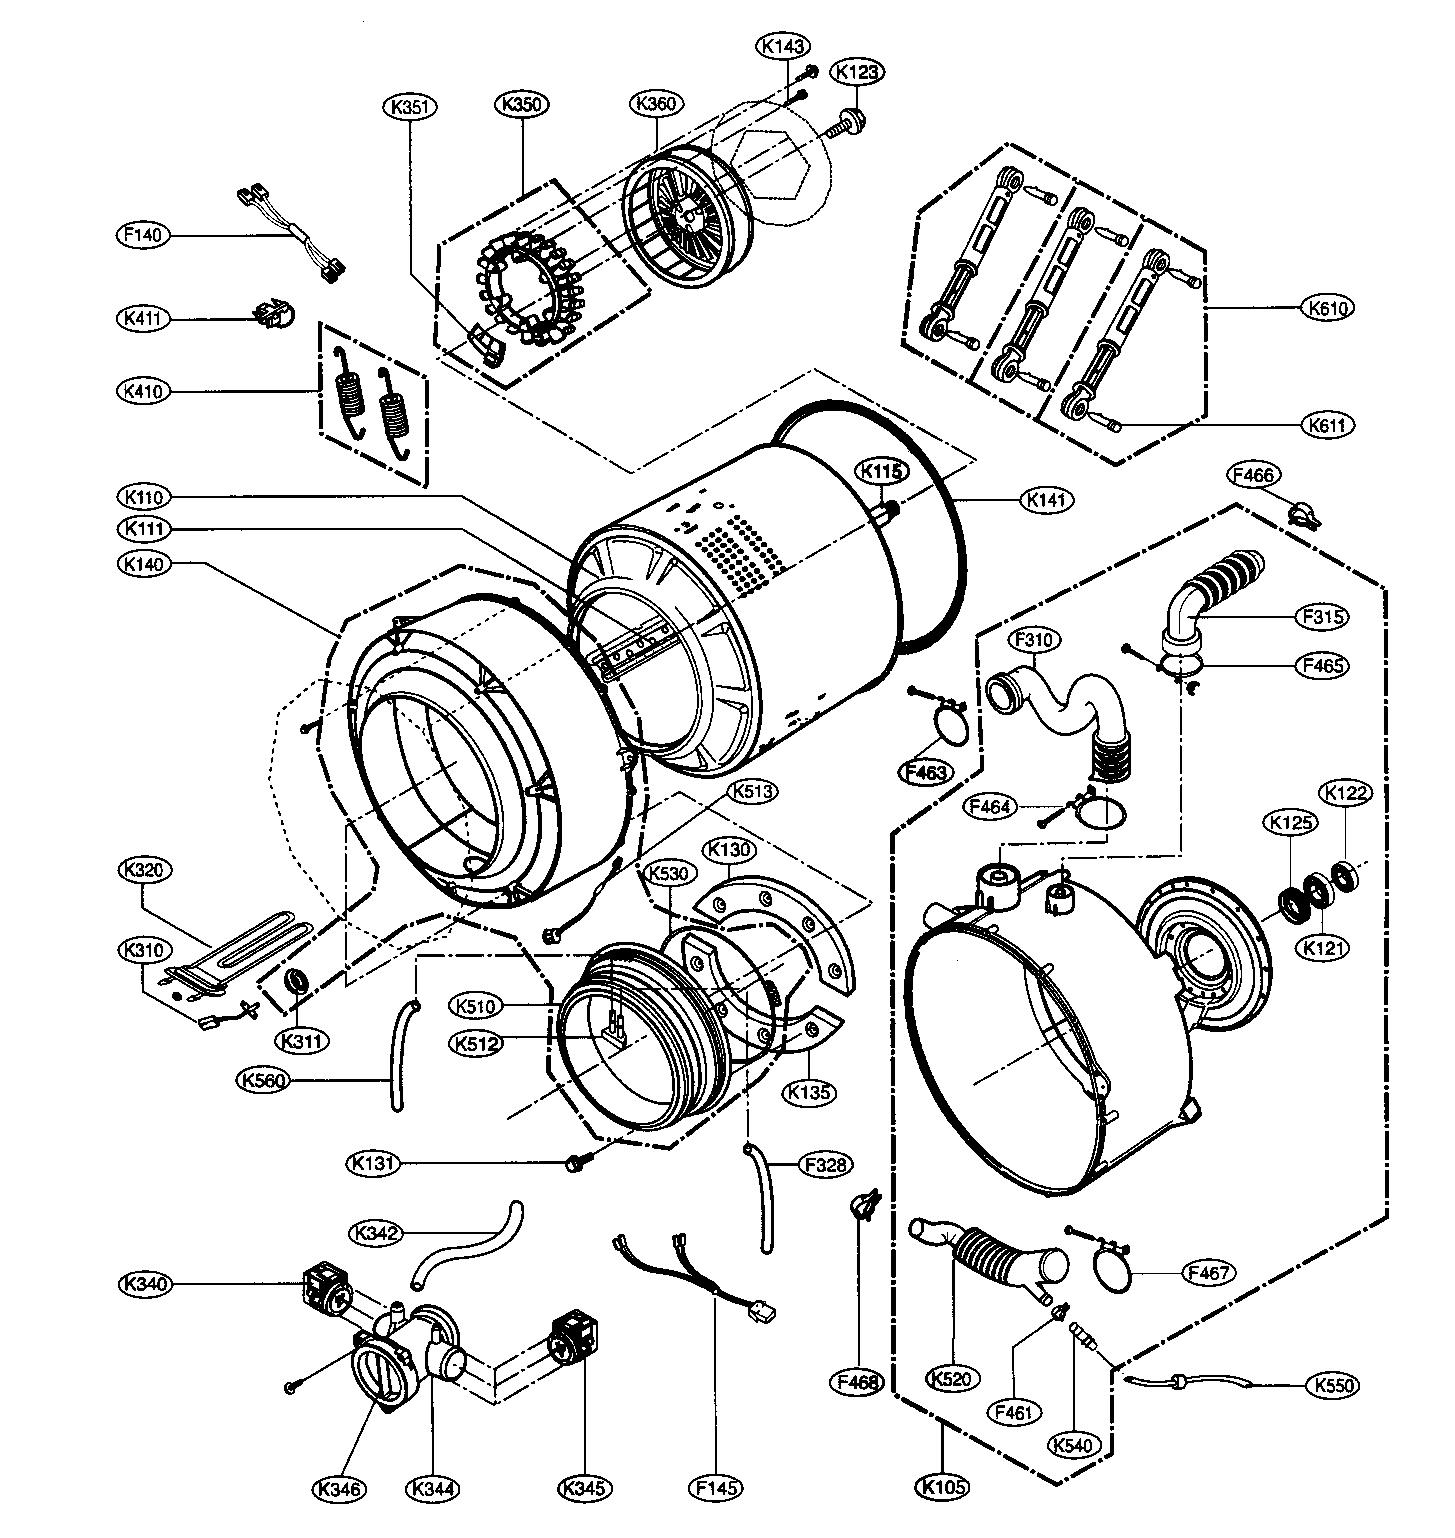 DRUM/TUB ASSY Diagram & Parts List for Model wm2688hnm LG